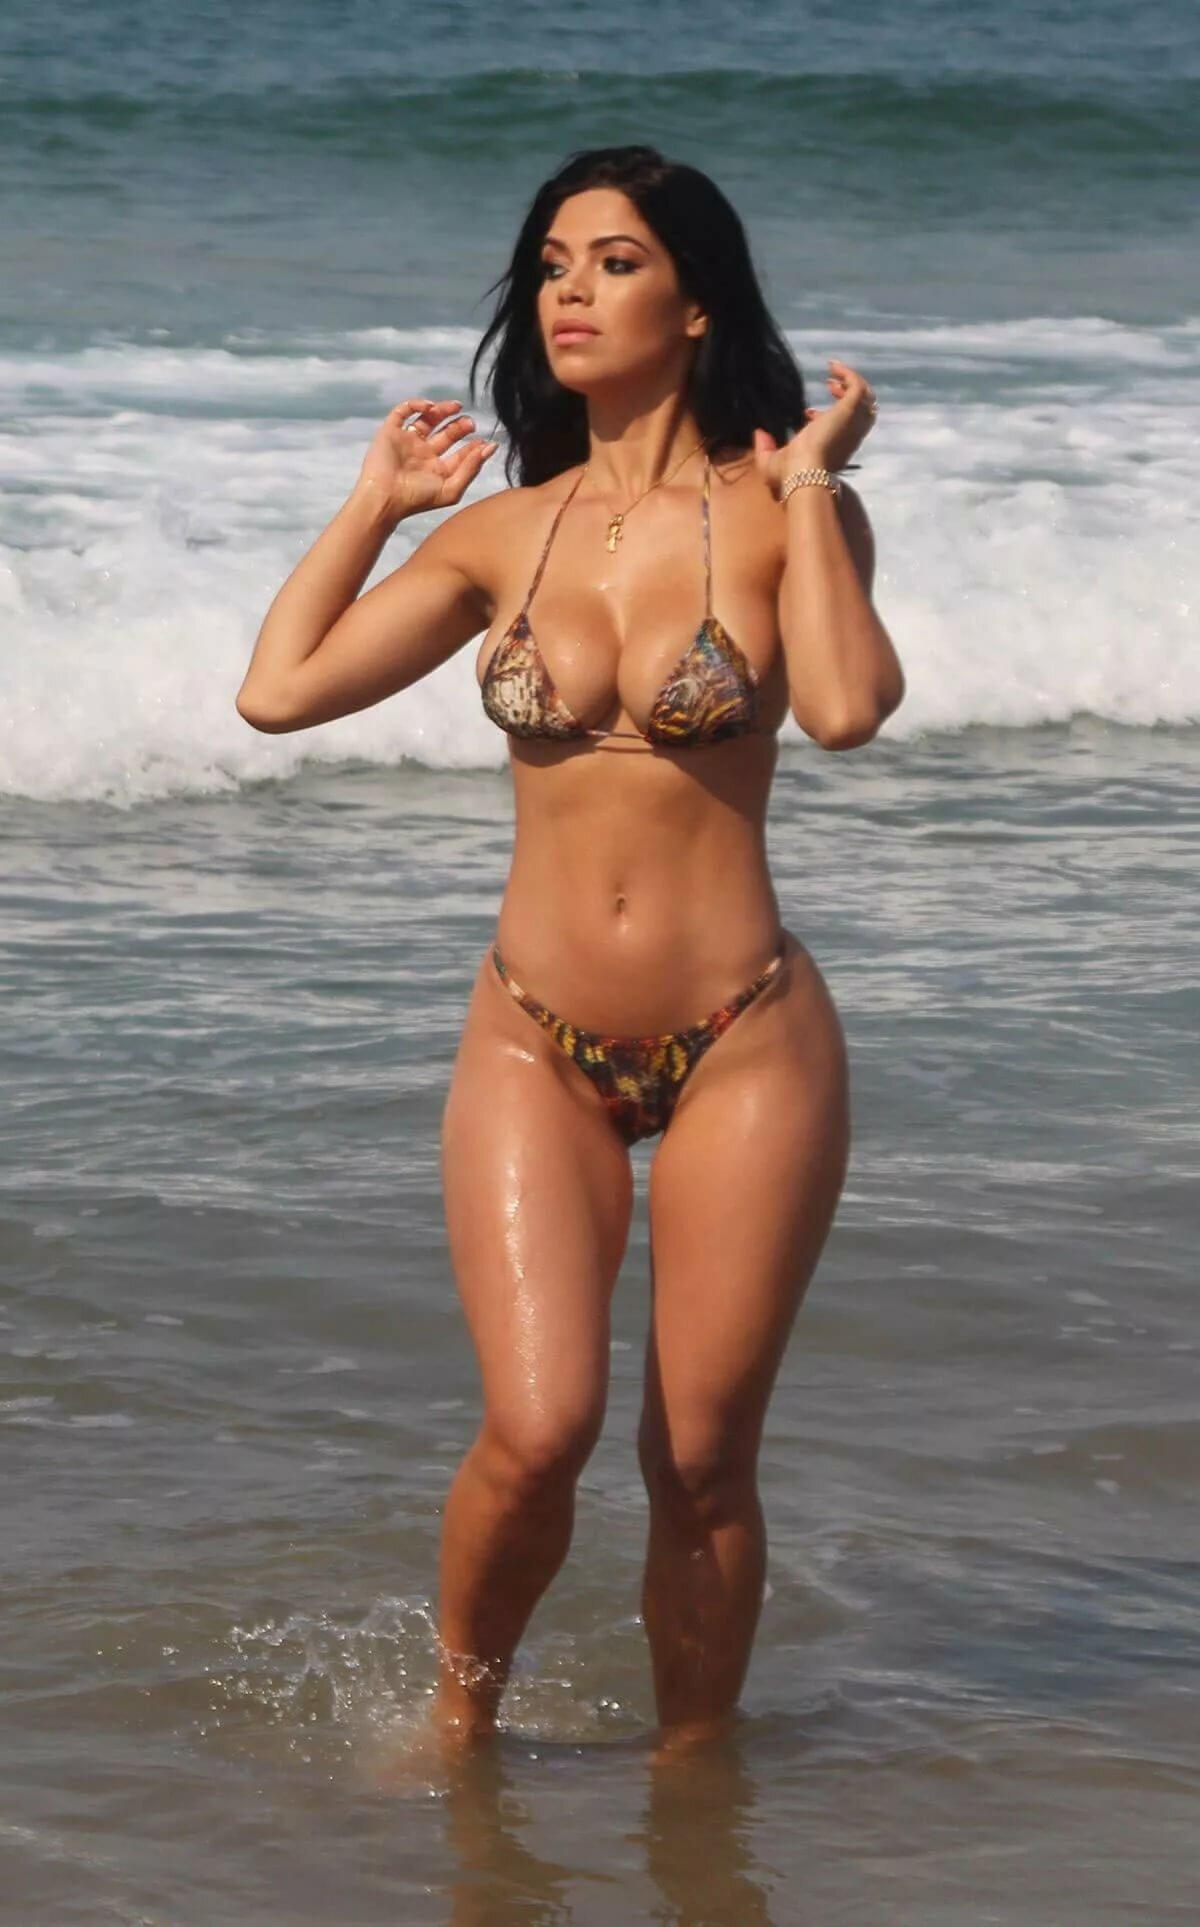 sexperiment-swedish-suelyn-medeiros-full-nude-pics